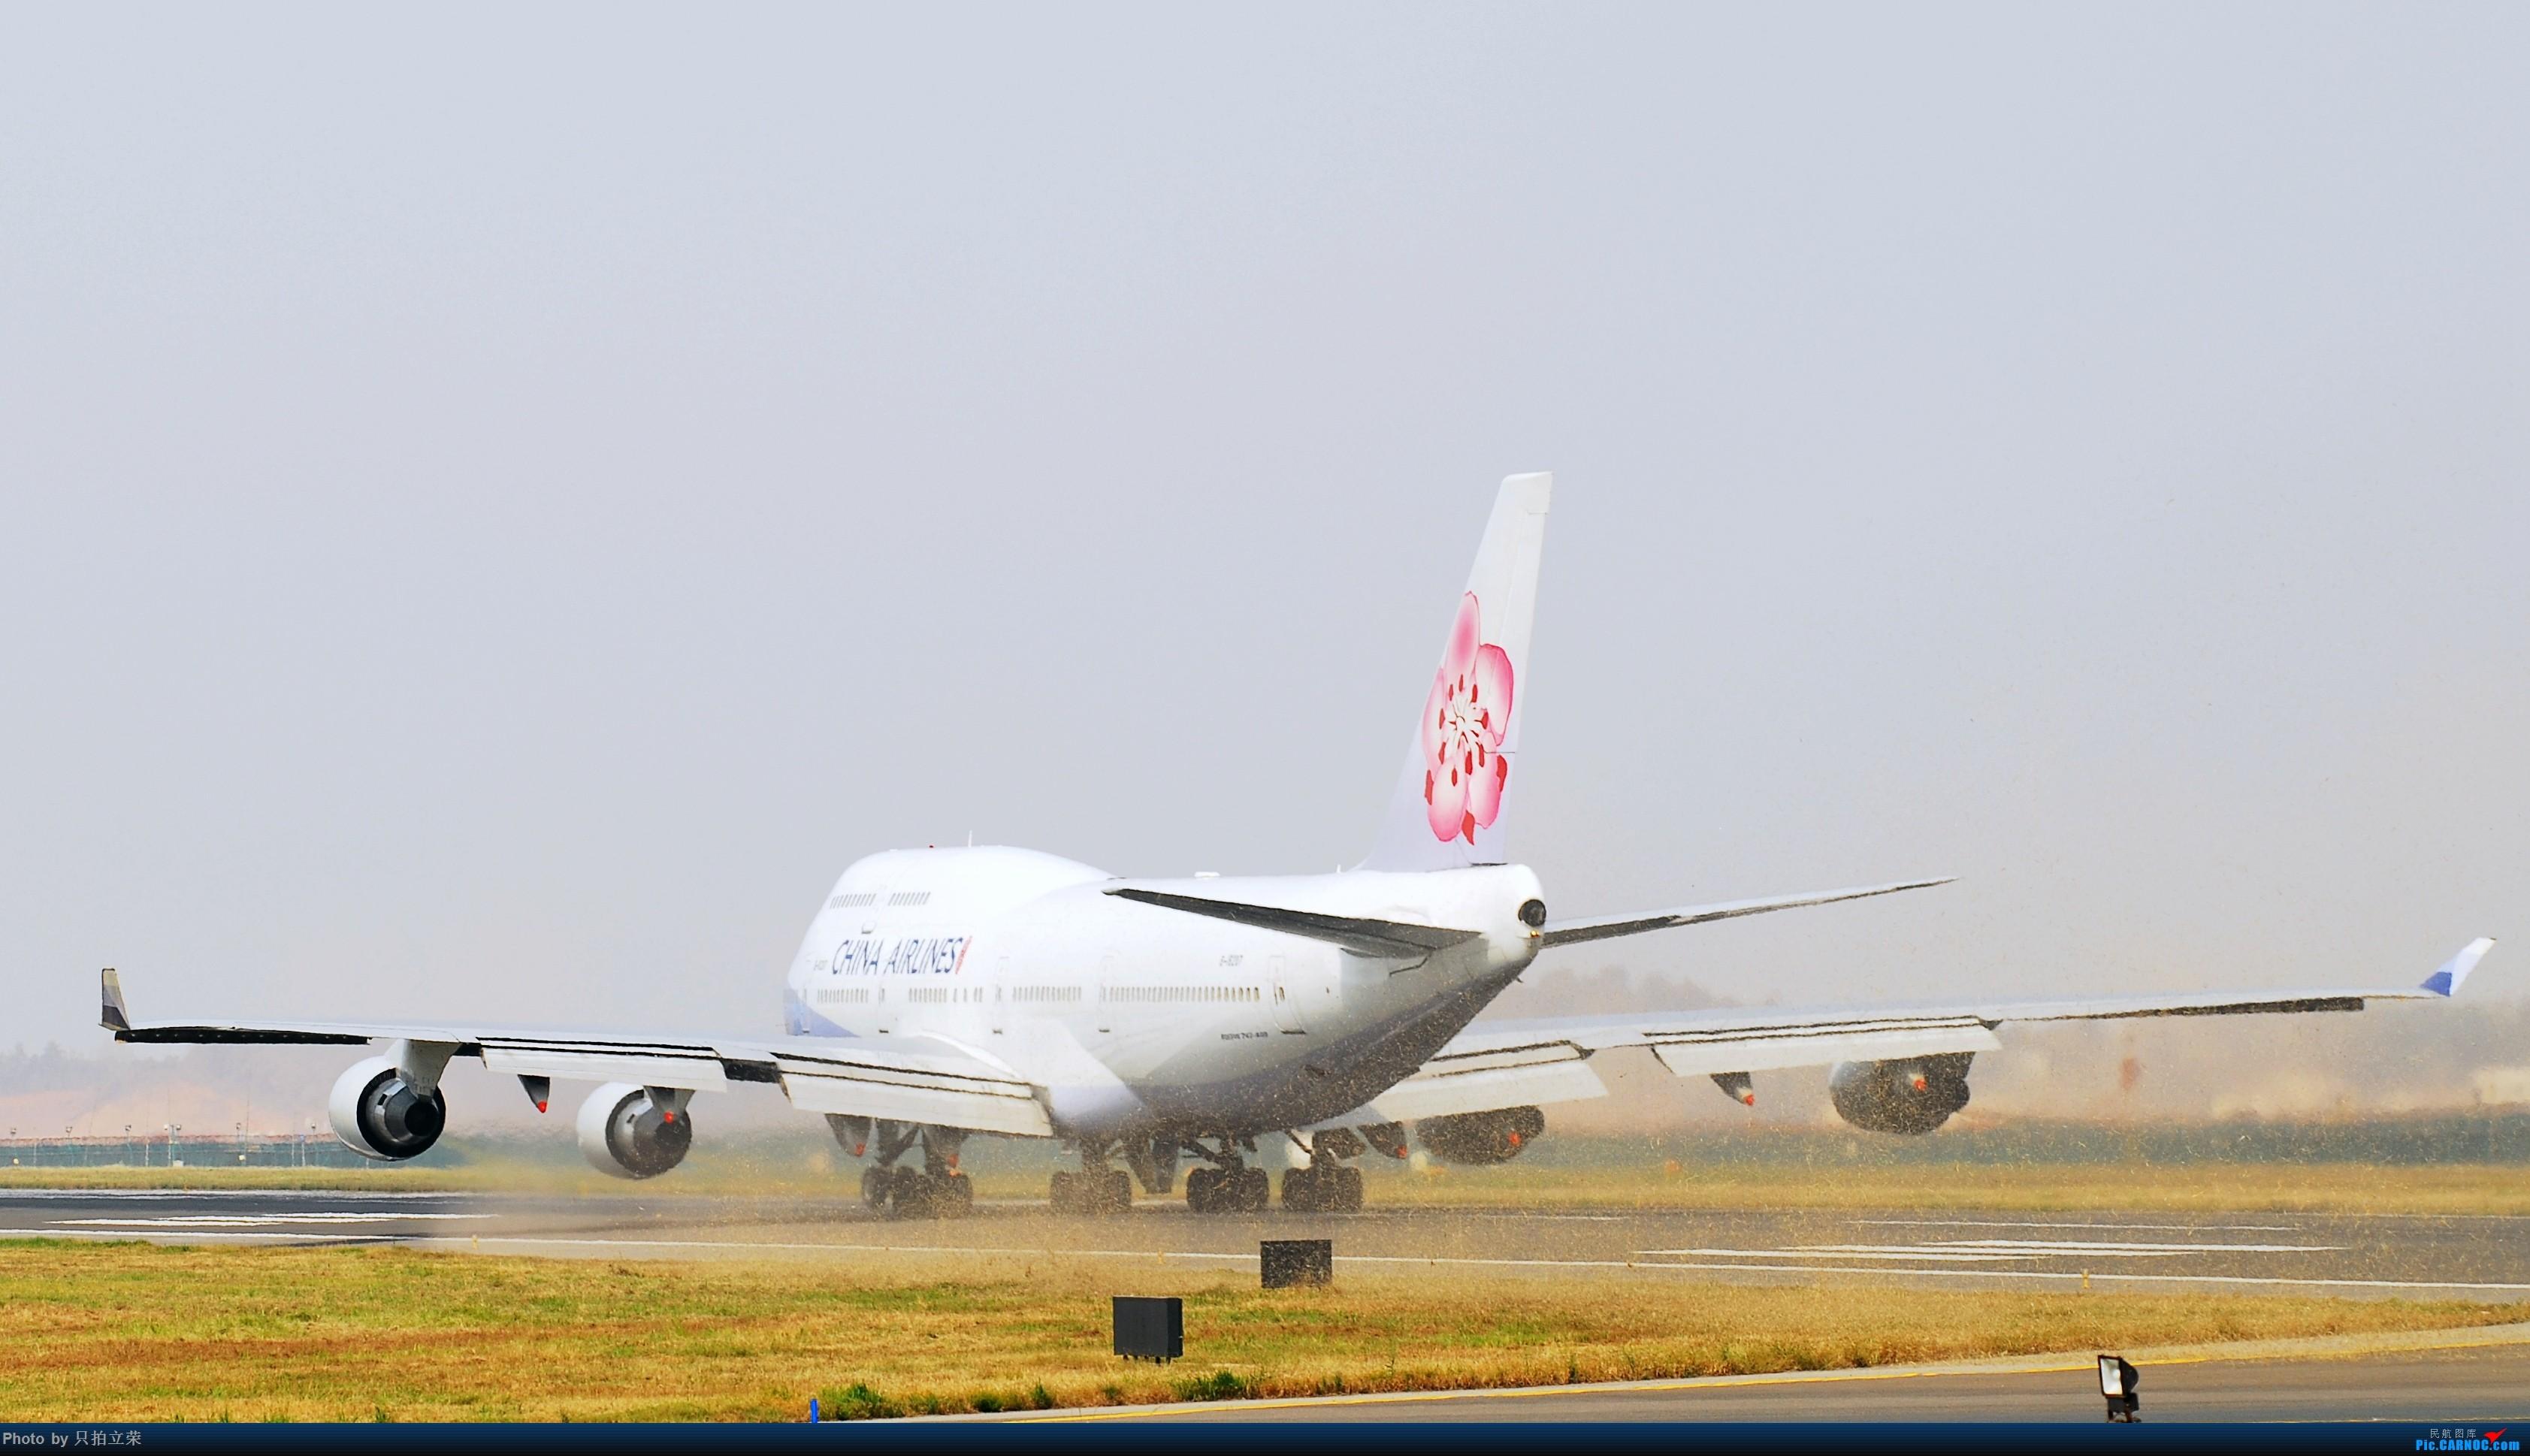 Re:[原创]第一次发图,长沙的大梅花们 BOEING 747-400 B-18207 中国长沙黄花国际机场